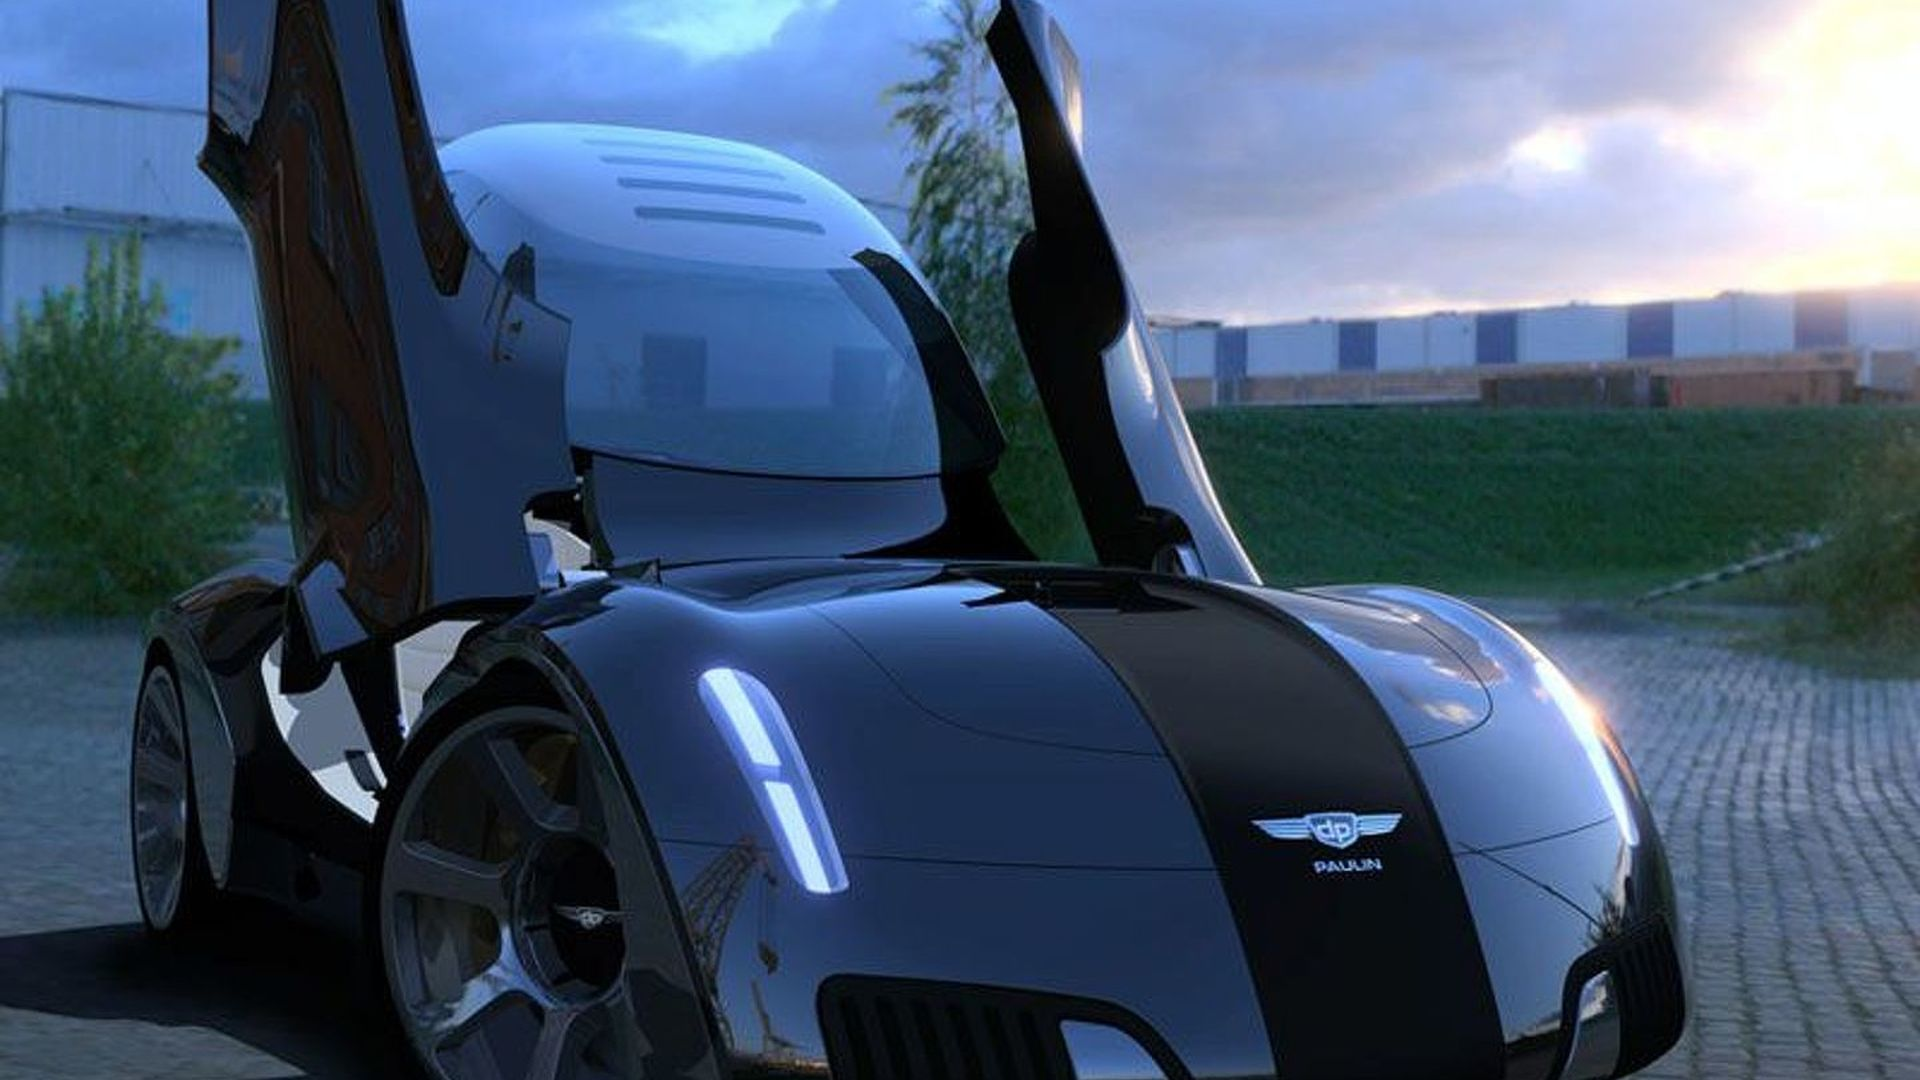 Paulin VR Concept: A look into the future